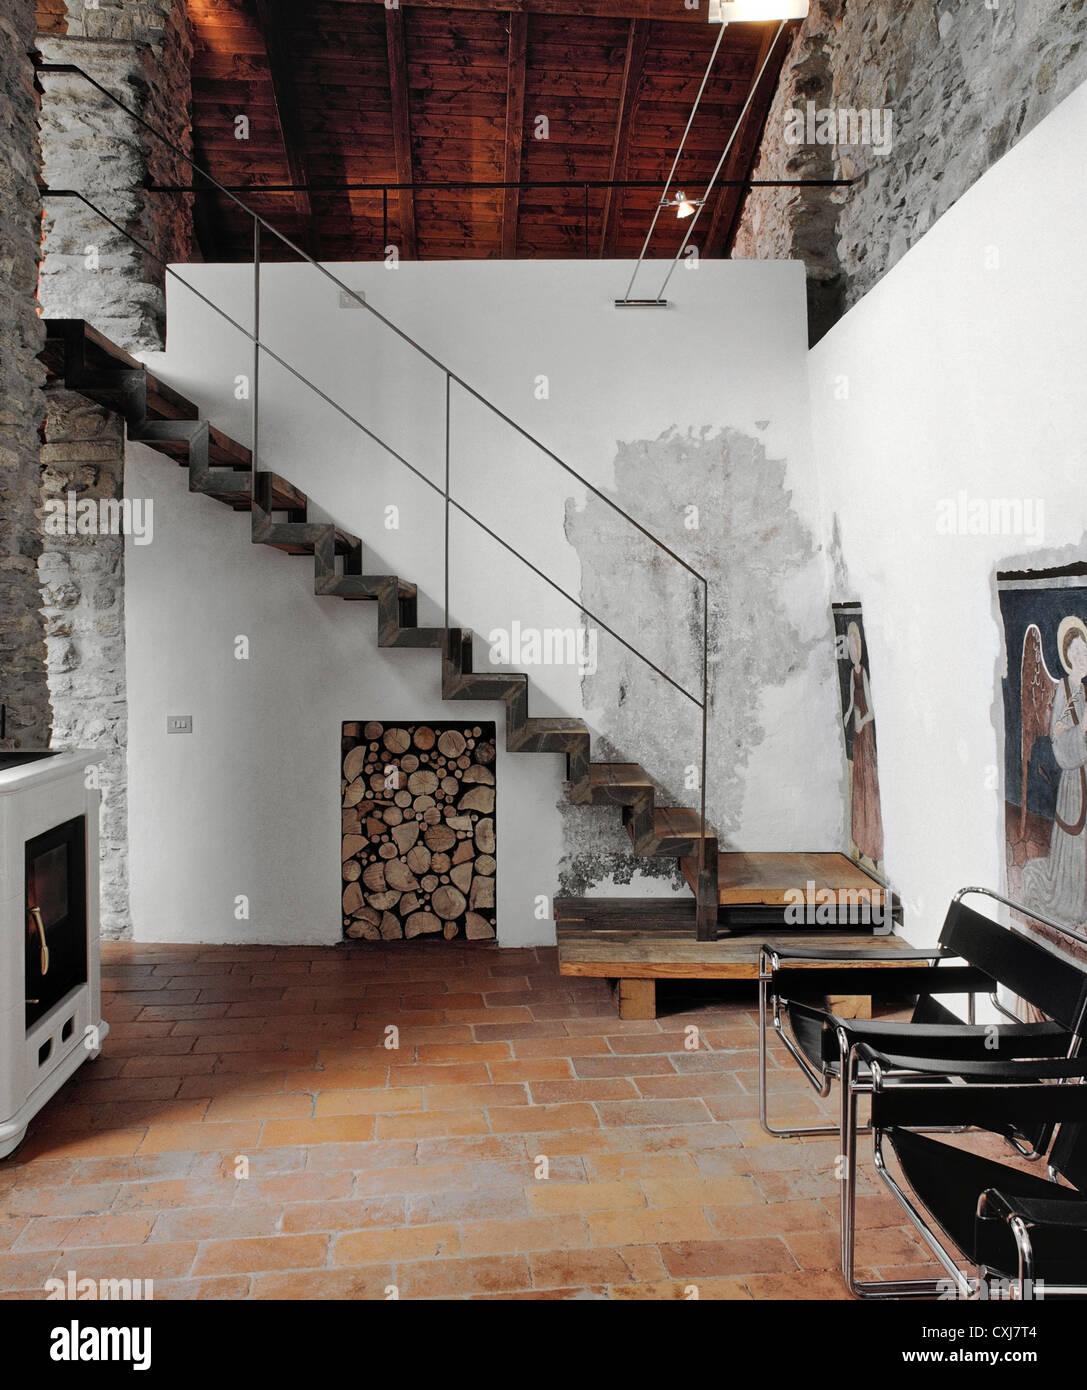 moderne treppe in die rustikale stube mit terrakotta b den stockfoto bild 50803092 alamy. Black Bedroom Furniture Sets. Home Design Ideas